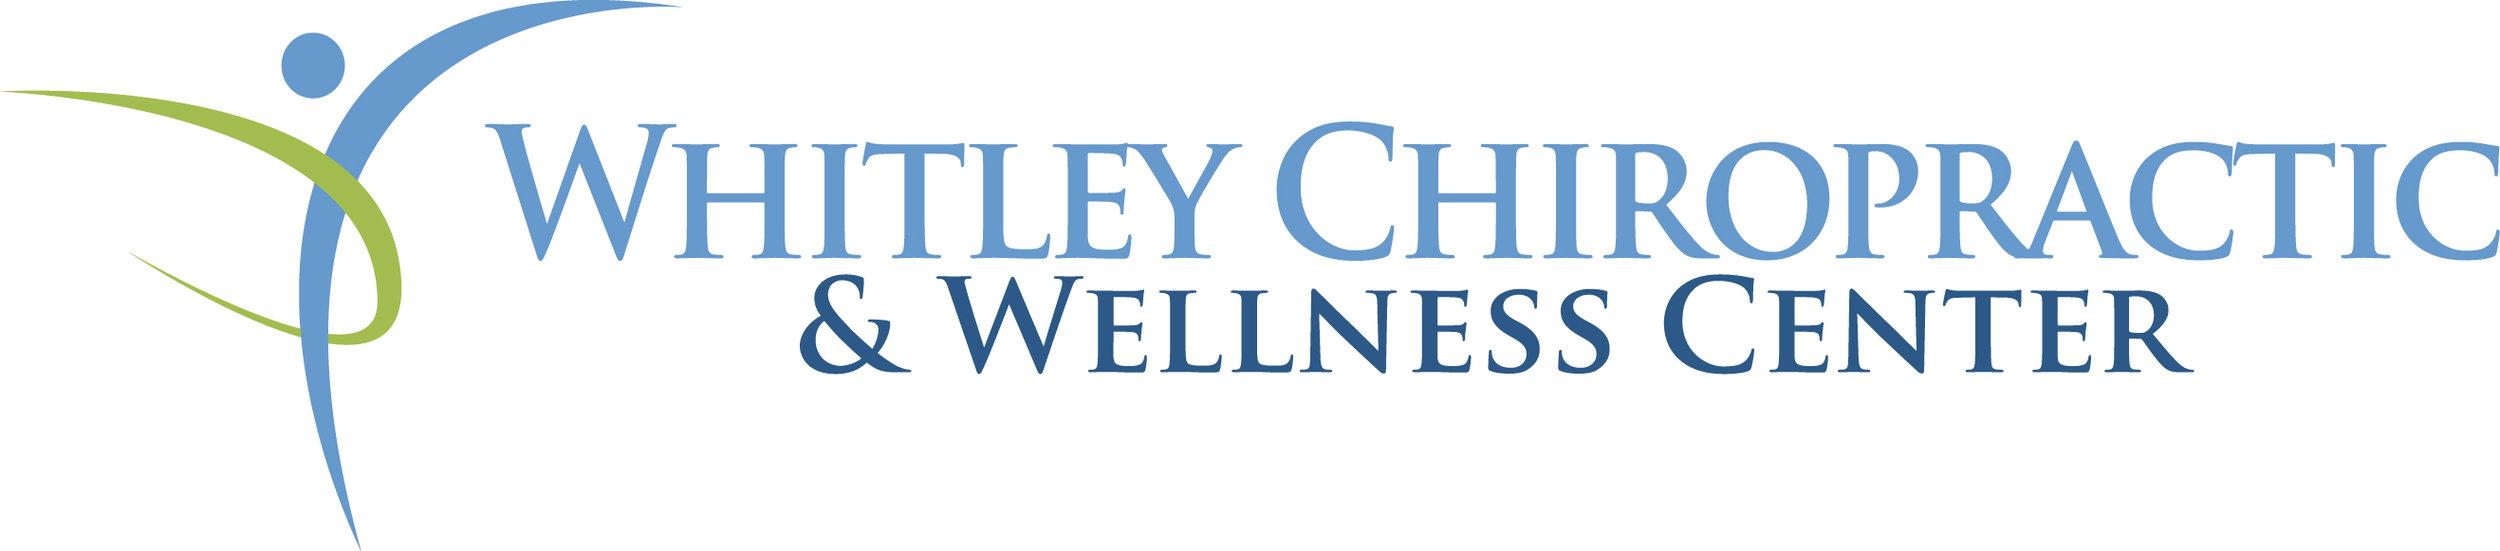 Whitley County Chiropractic.jpg